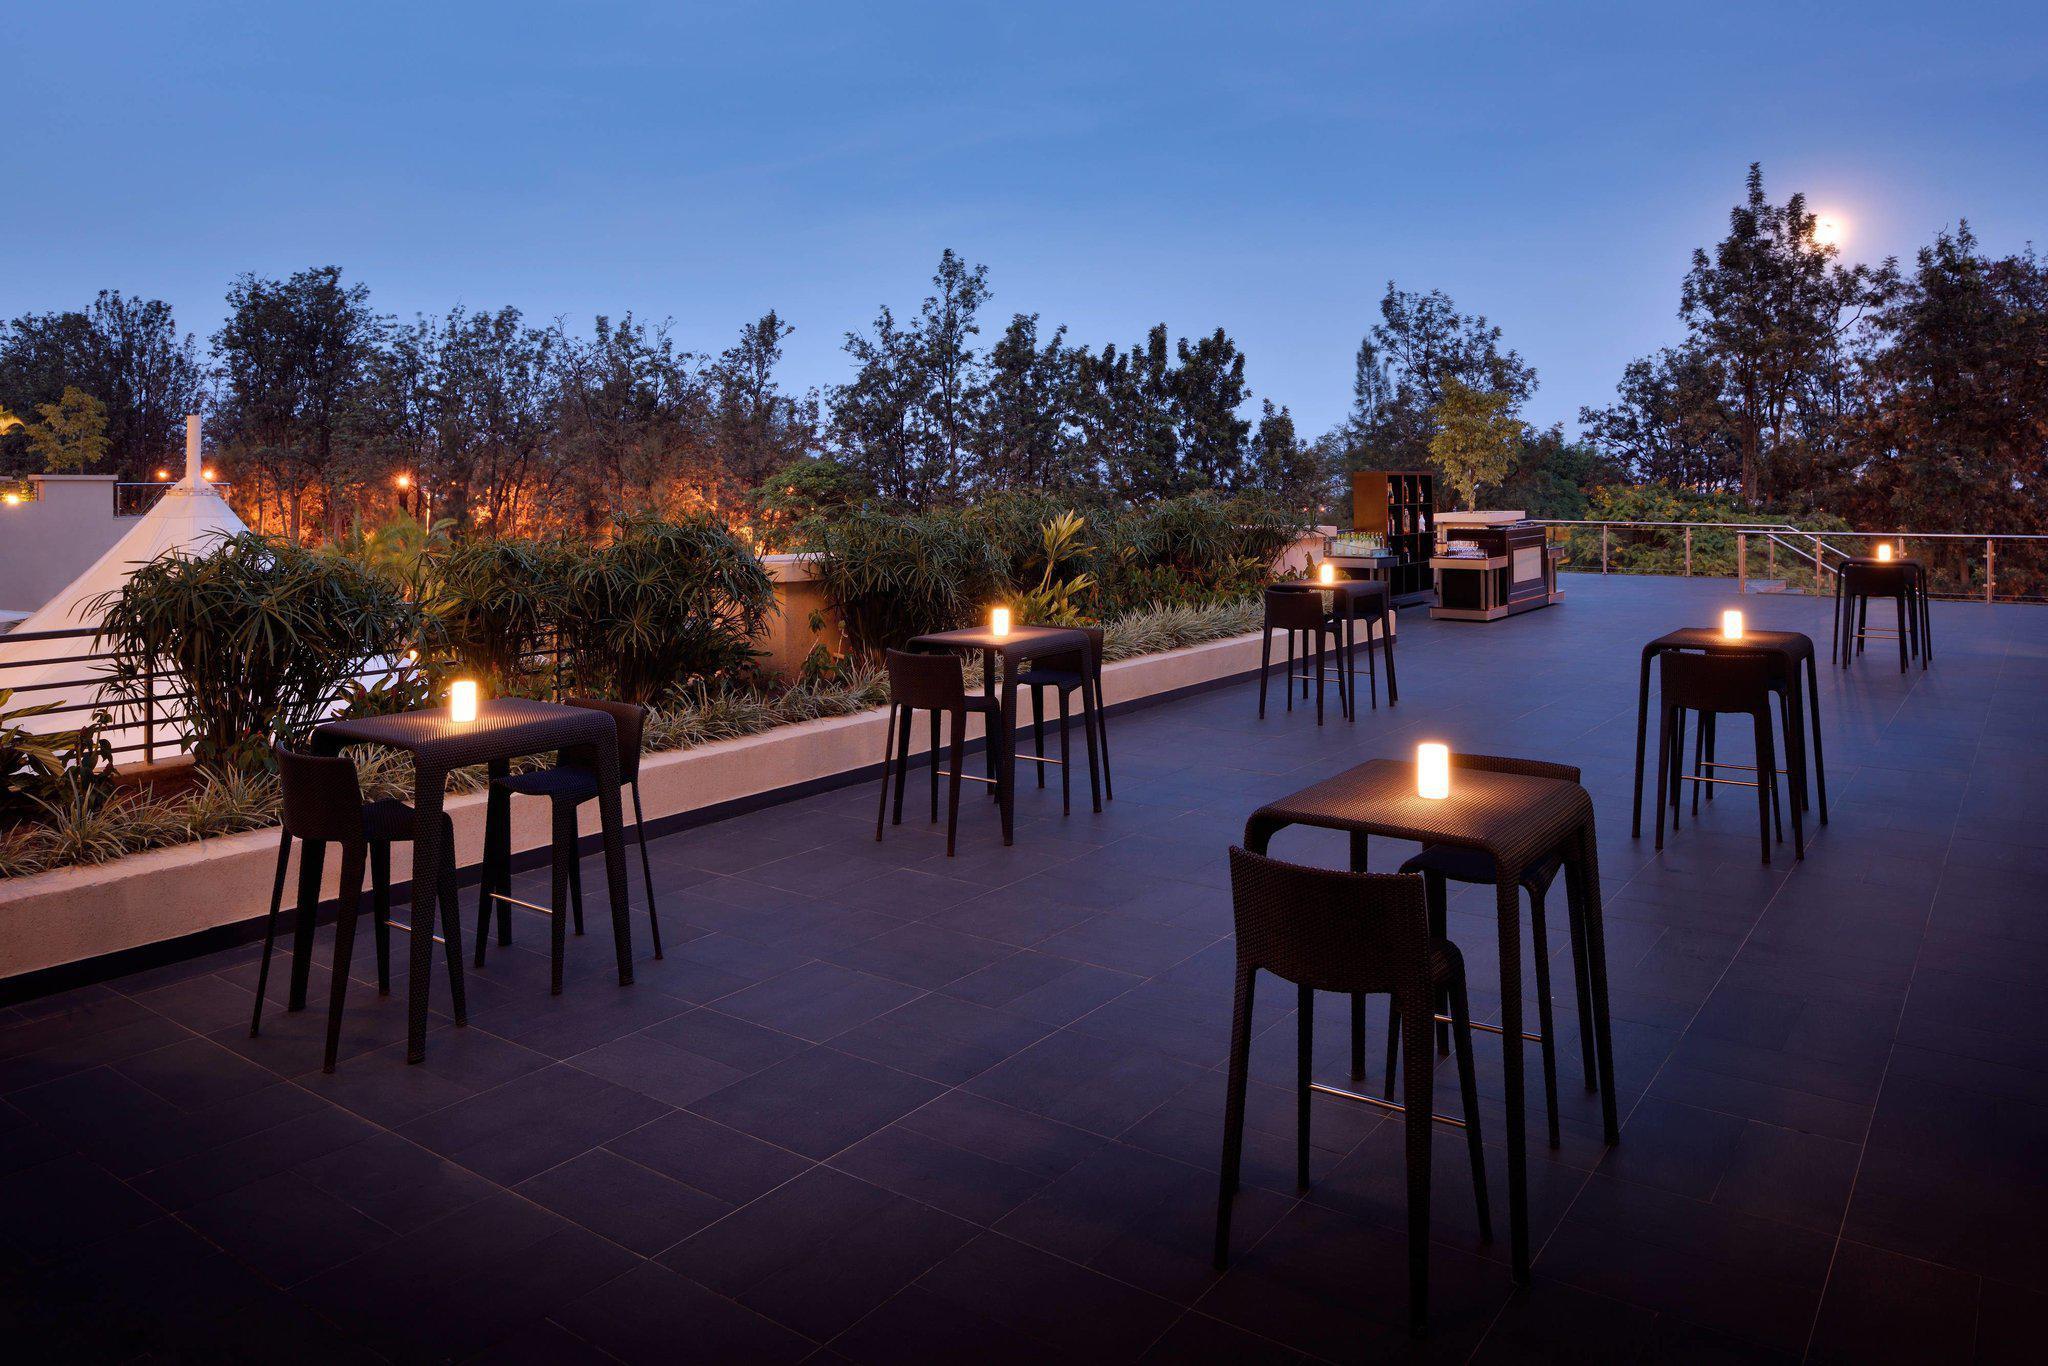 Kigali Marriott Hotel, Kigali Hotels - Skyscanner